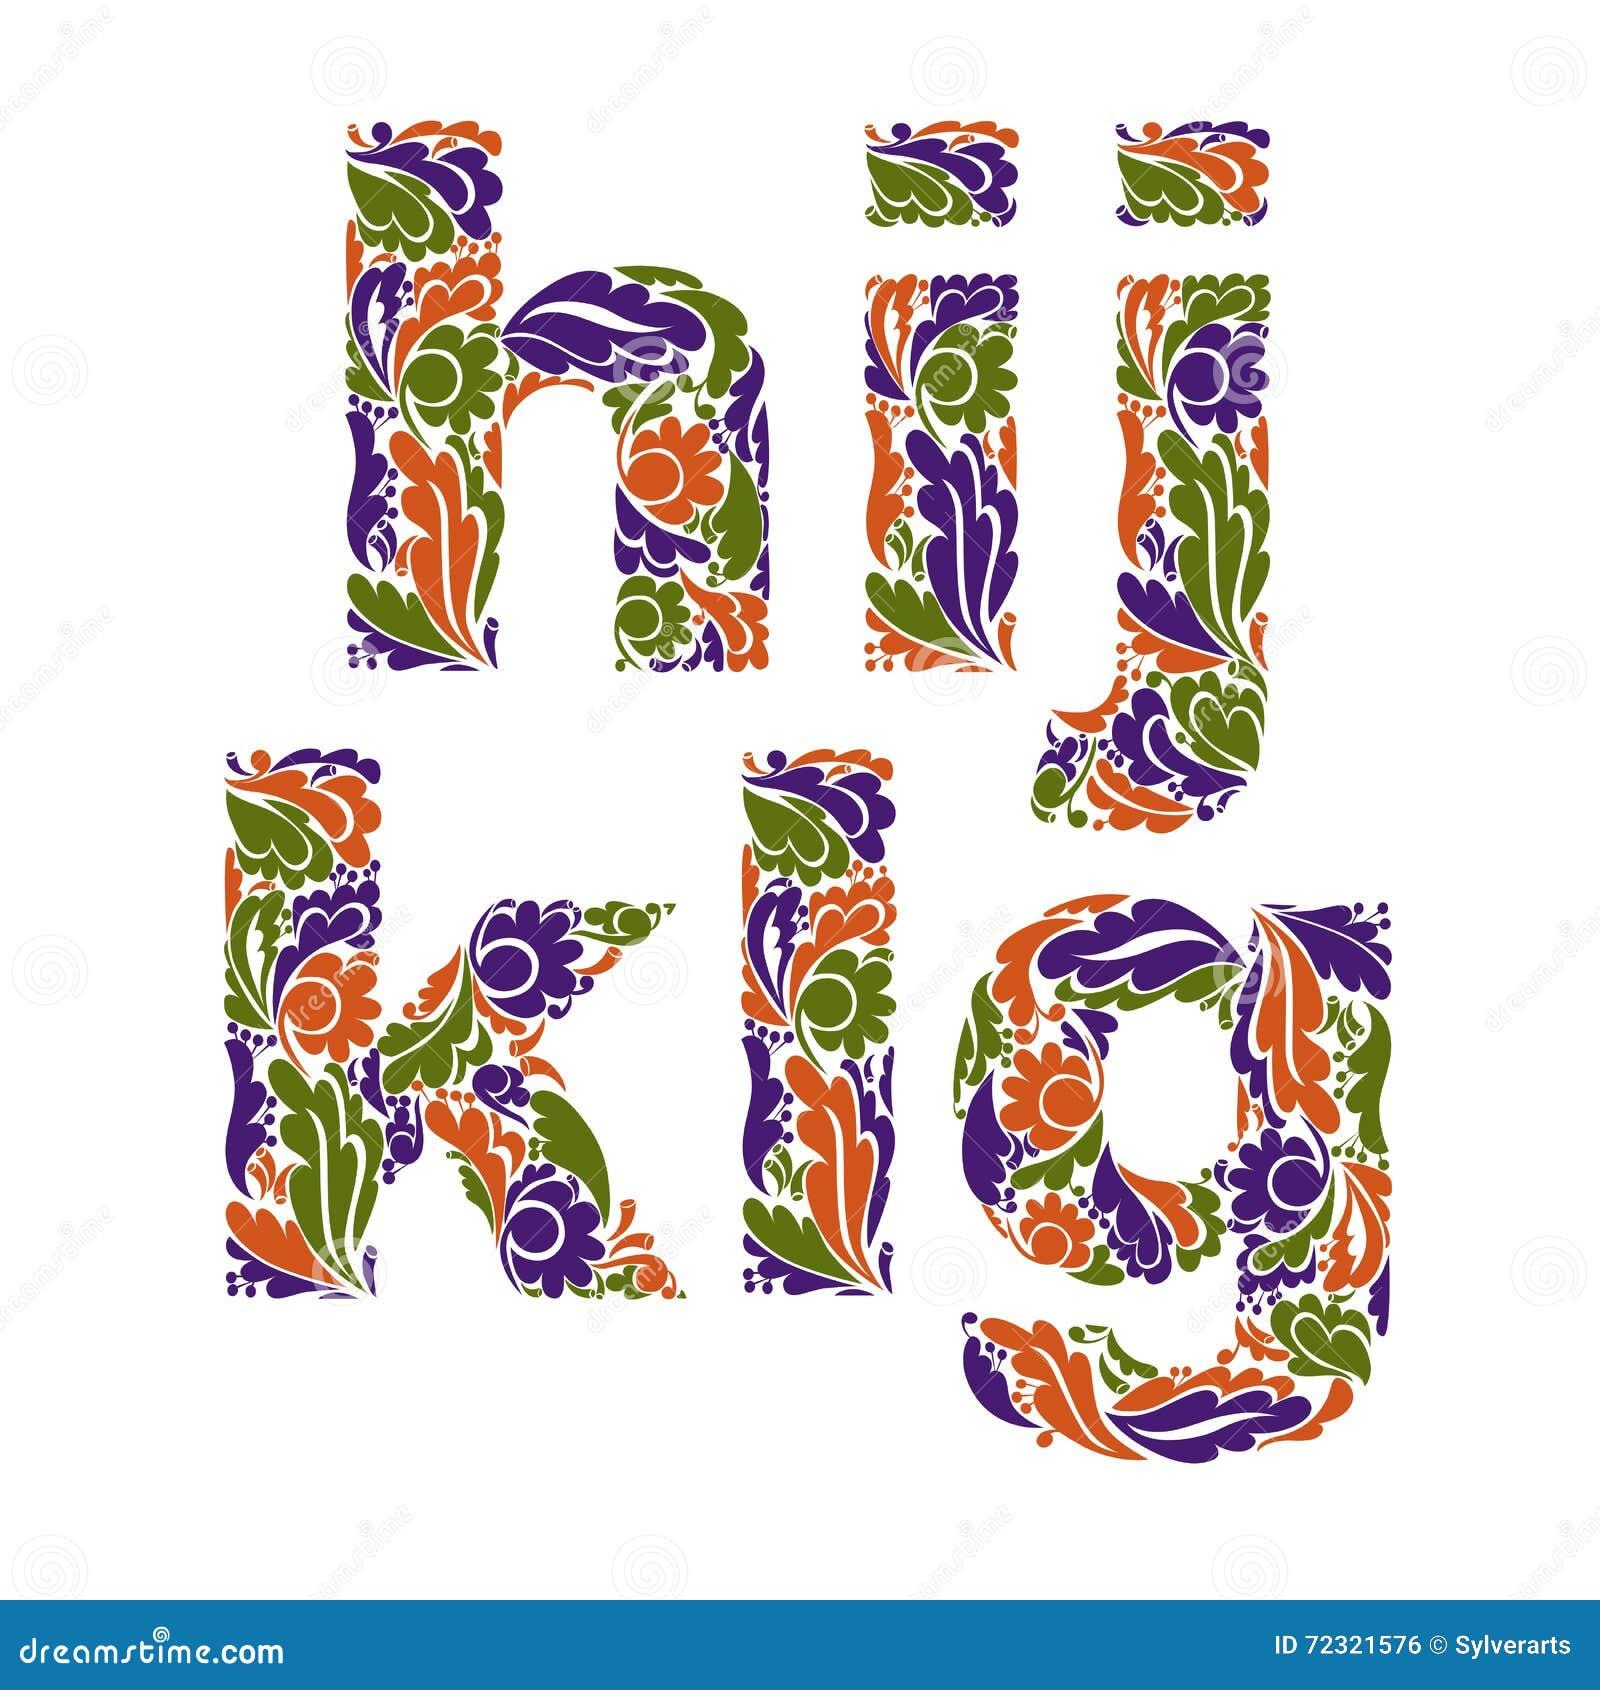 Decorative Letters Beautiful Floral Font Decorative Letters With Vintage Pattern